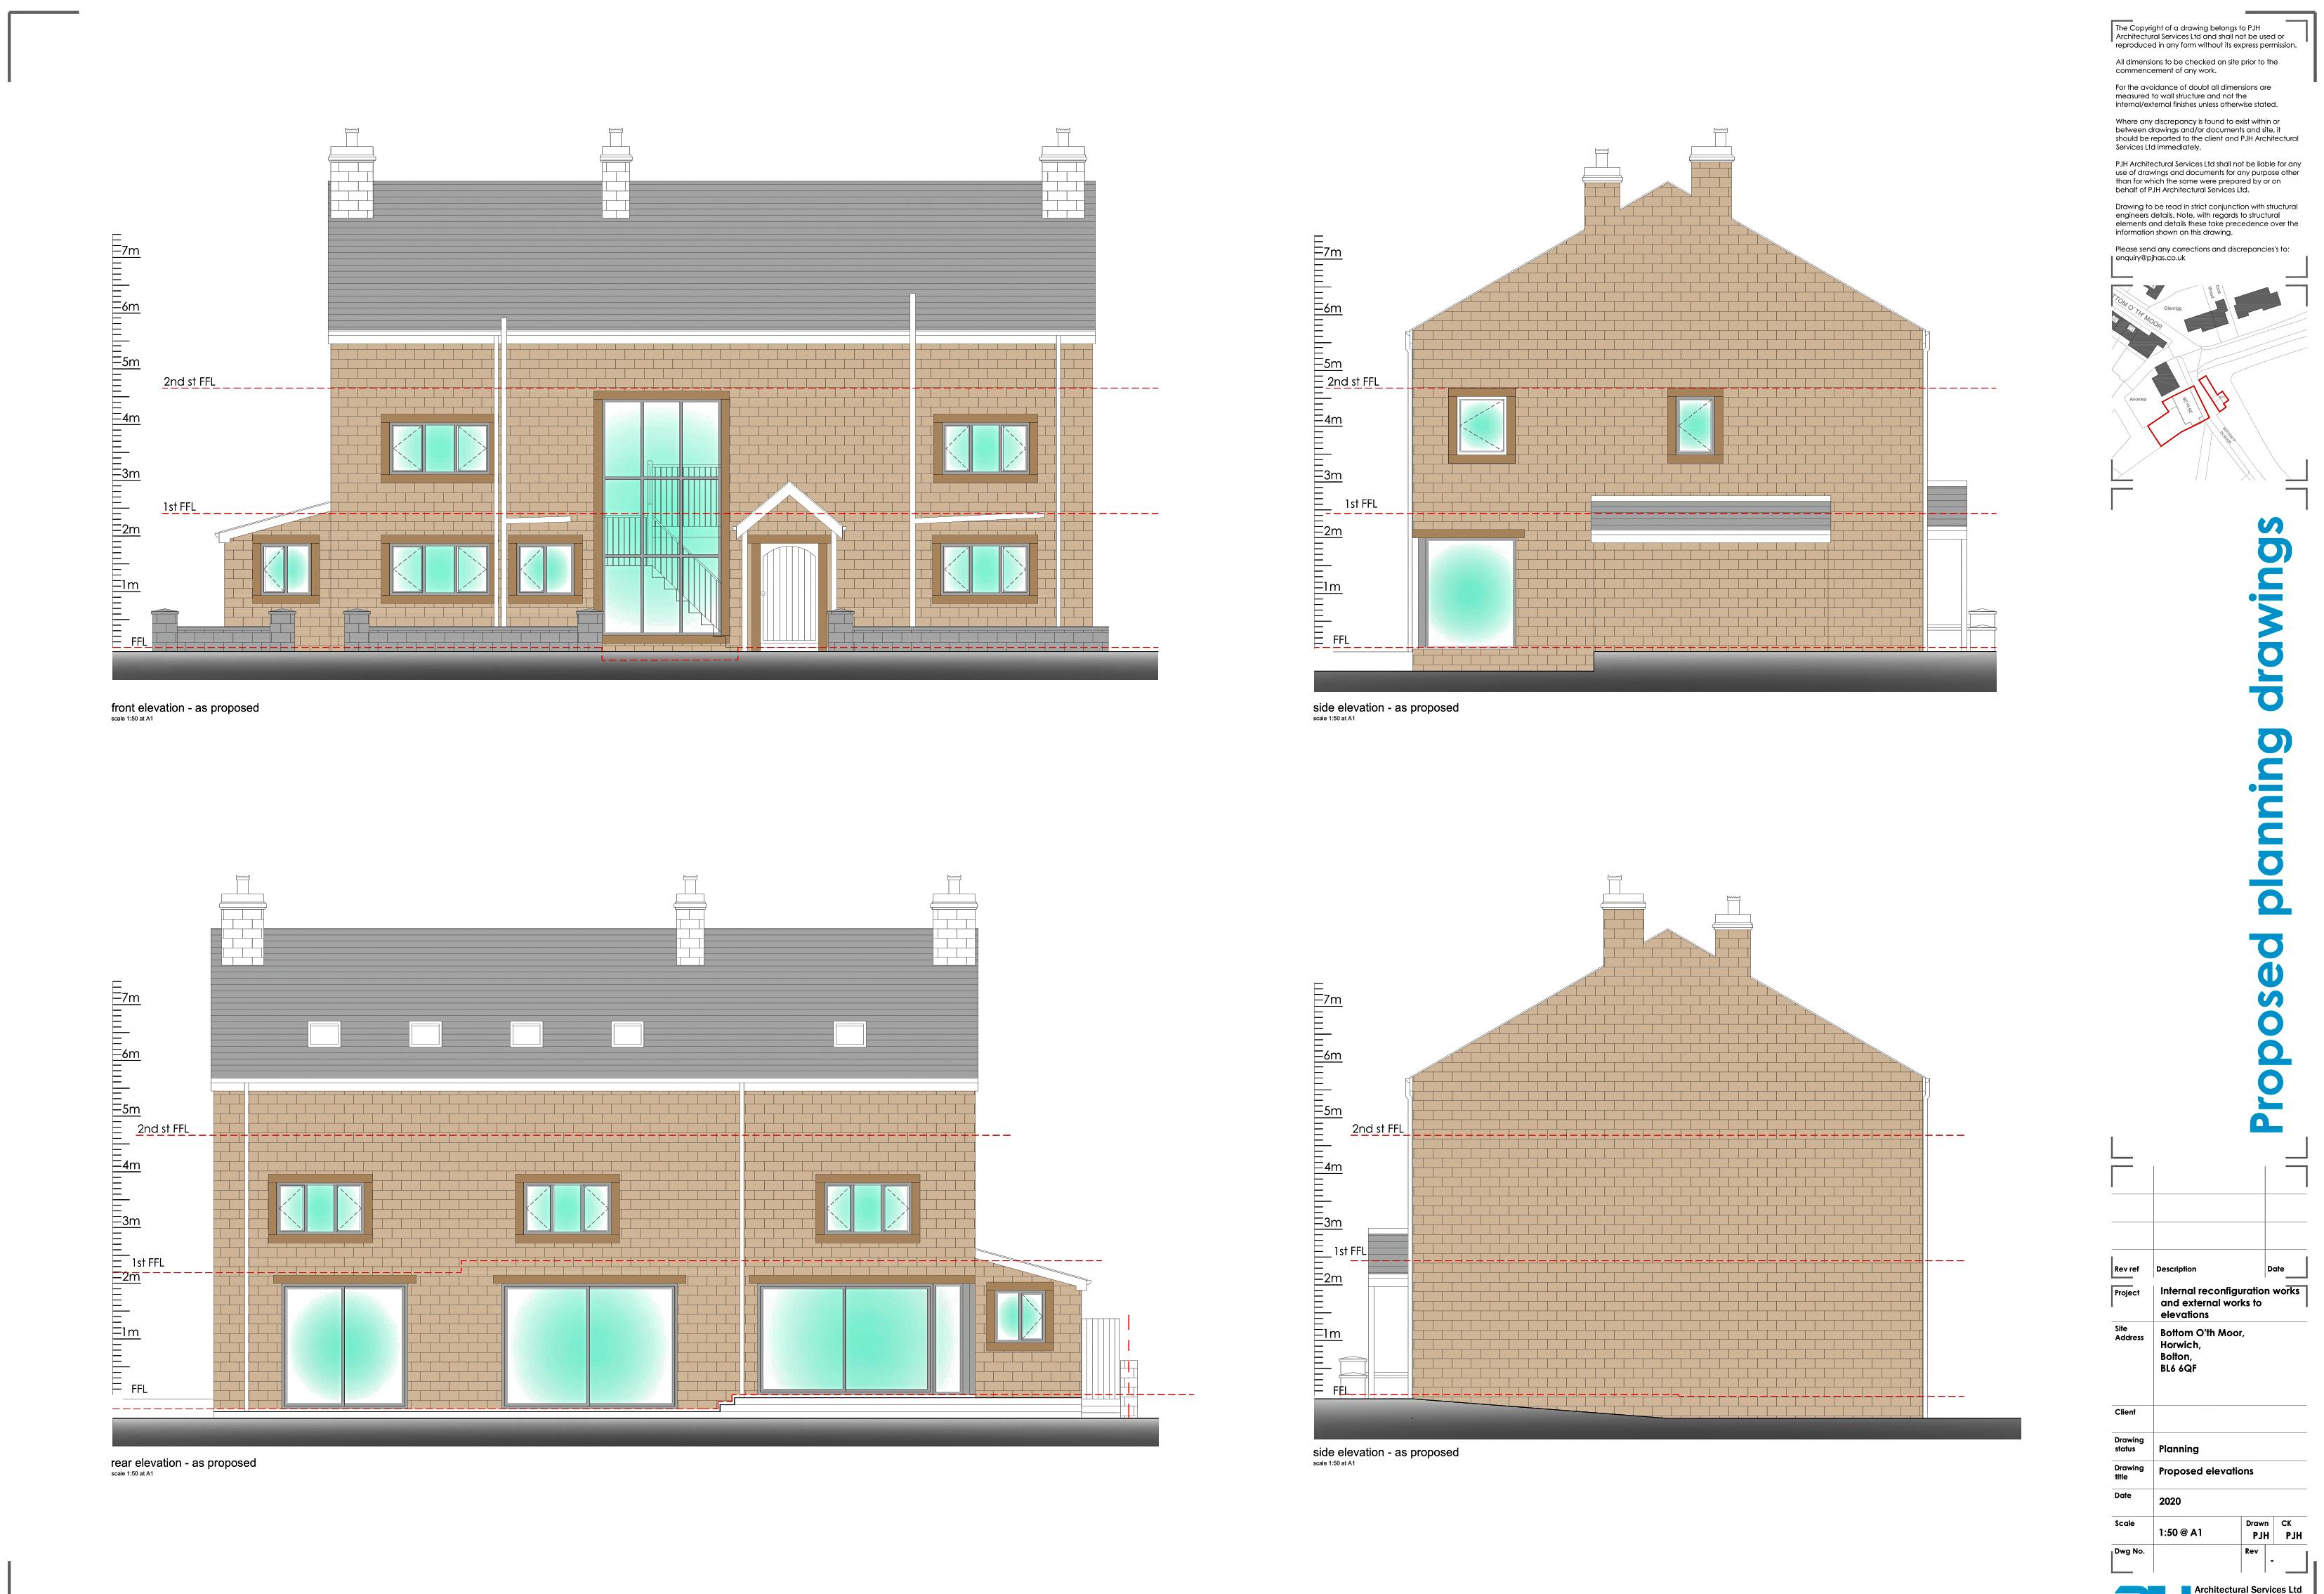 Horwich Architect